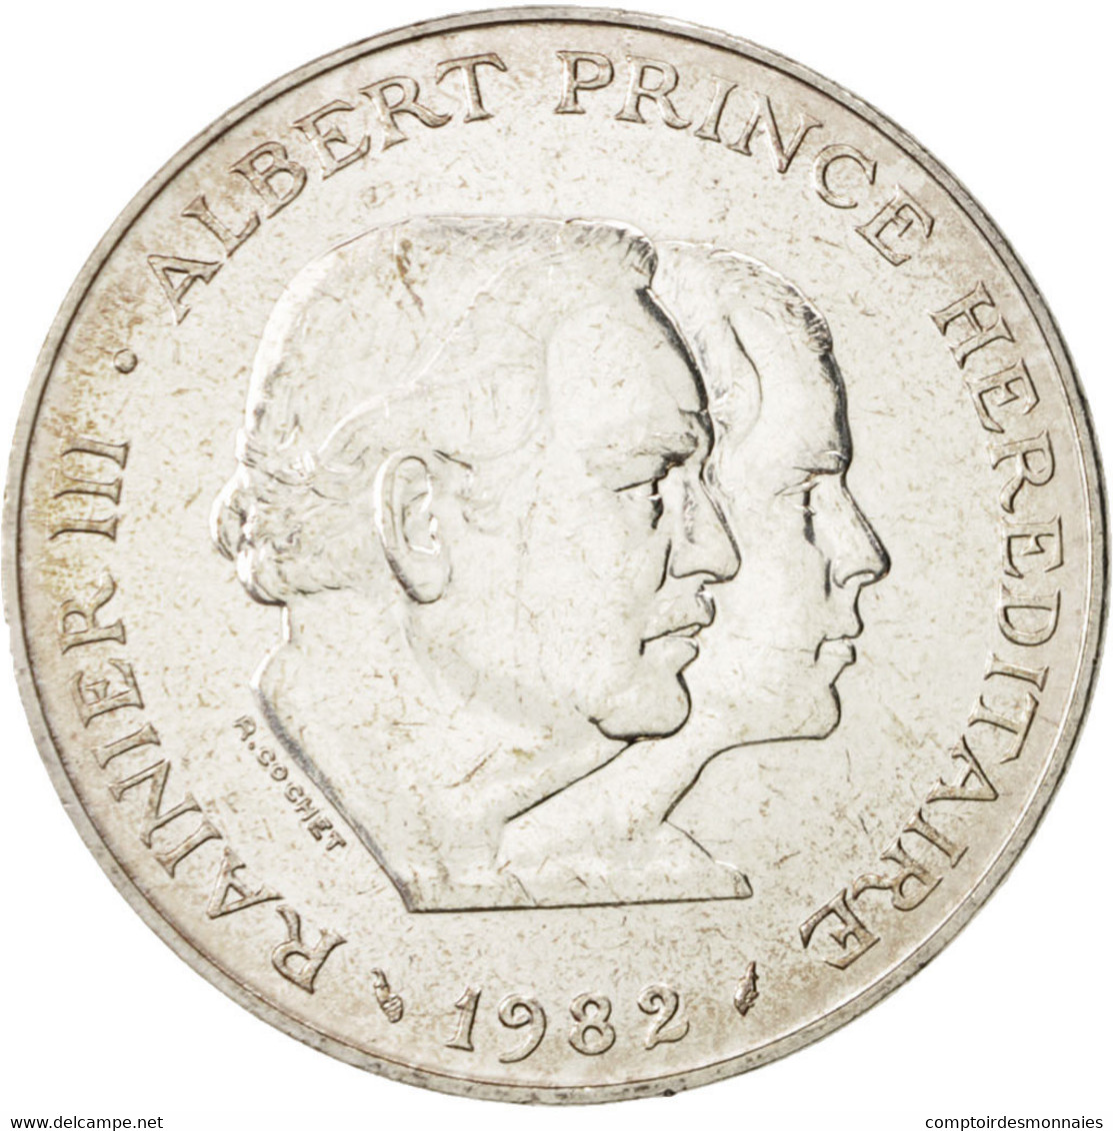 Monaco, Rainier III, 100 Francs, 1982, SPL, Argent, KM:161 - Monaco